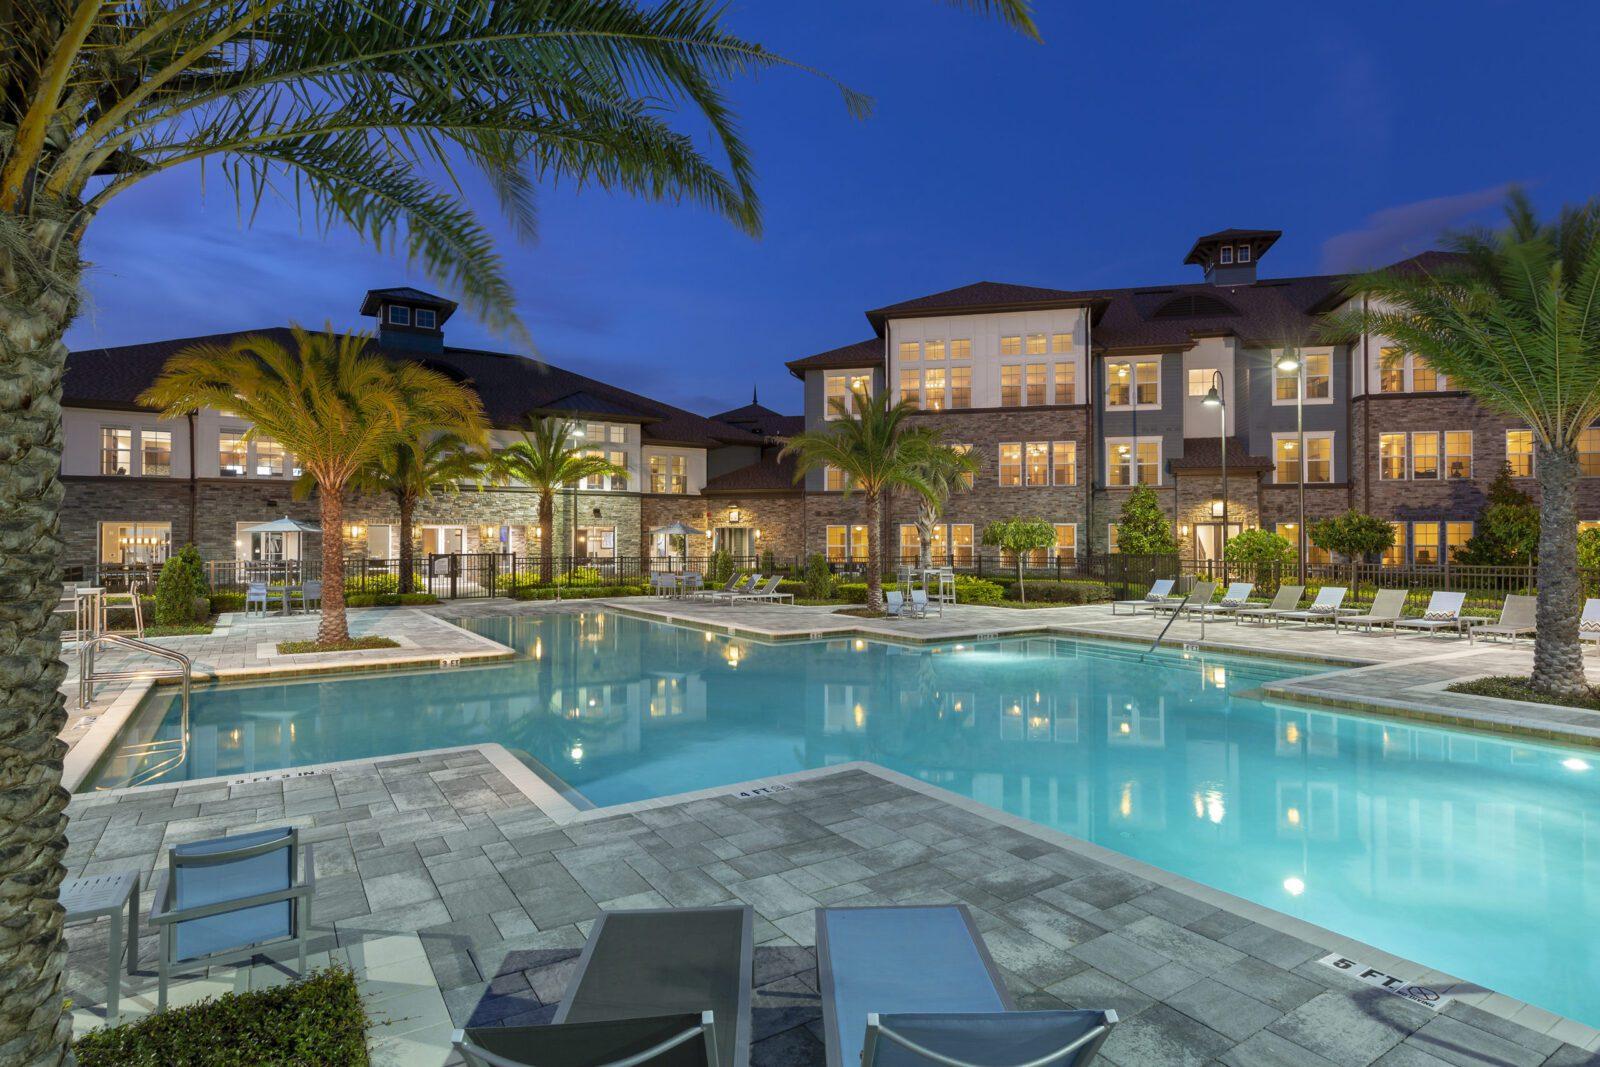 The Addison at Windermere | Windermere, FL | 316 Units